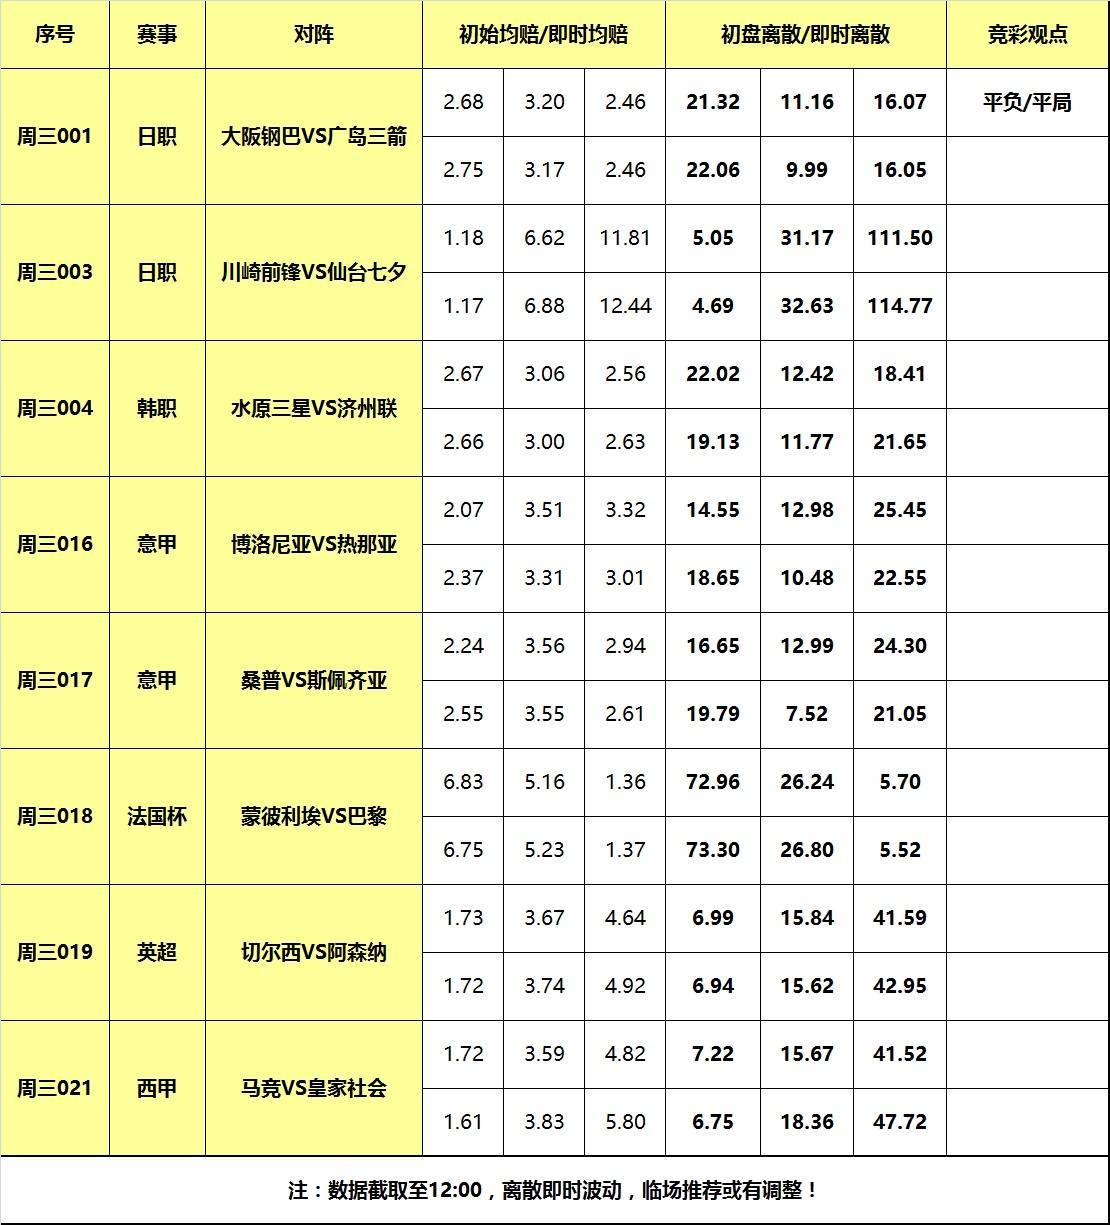 https://cdn.ttyingqiu.com/news/image/2021/5/12/202105121422000020.jpg